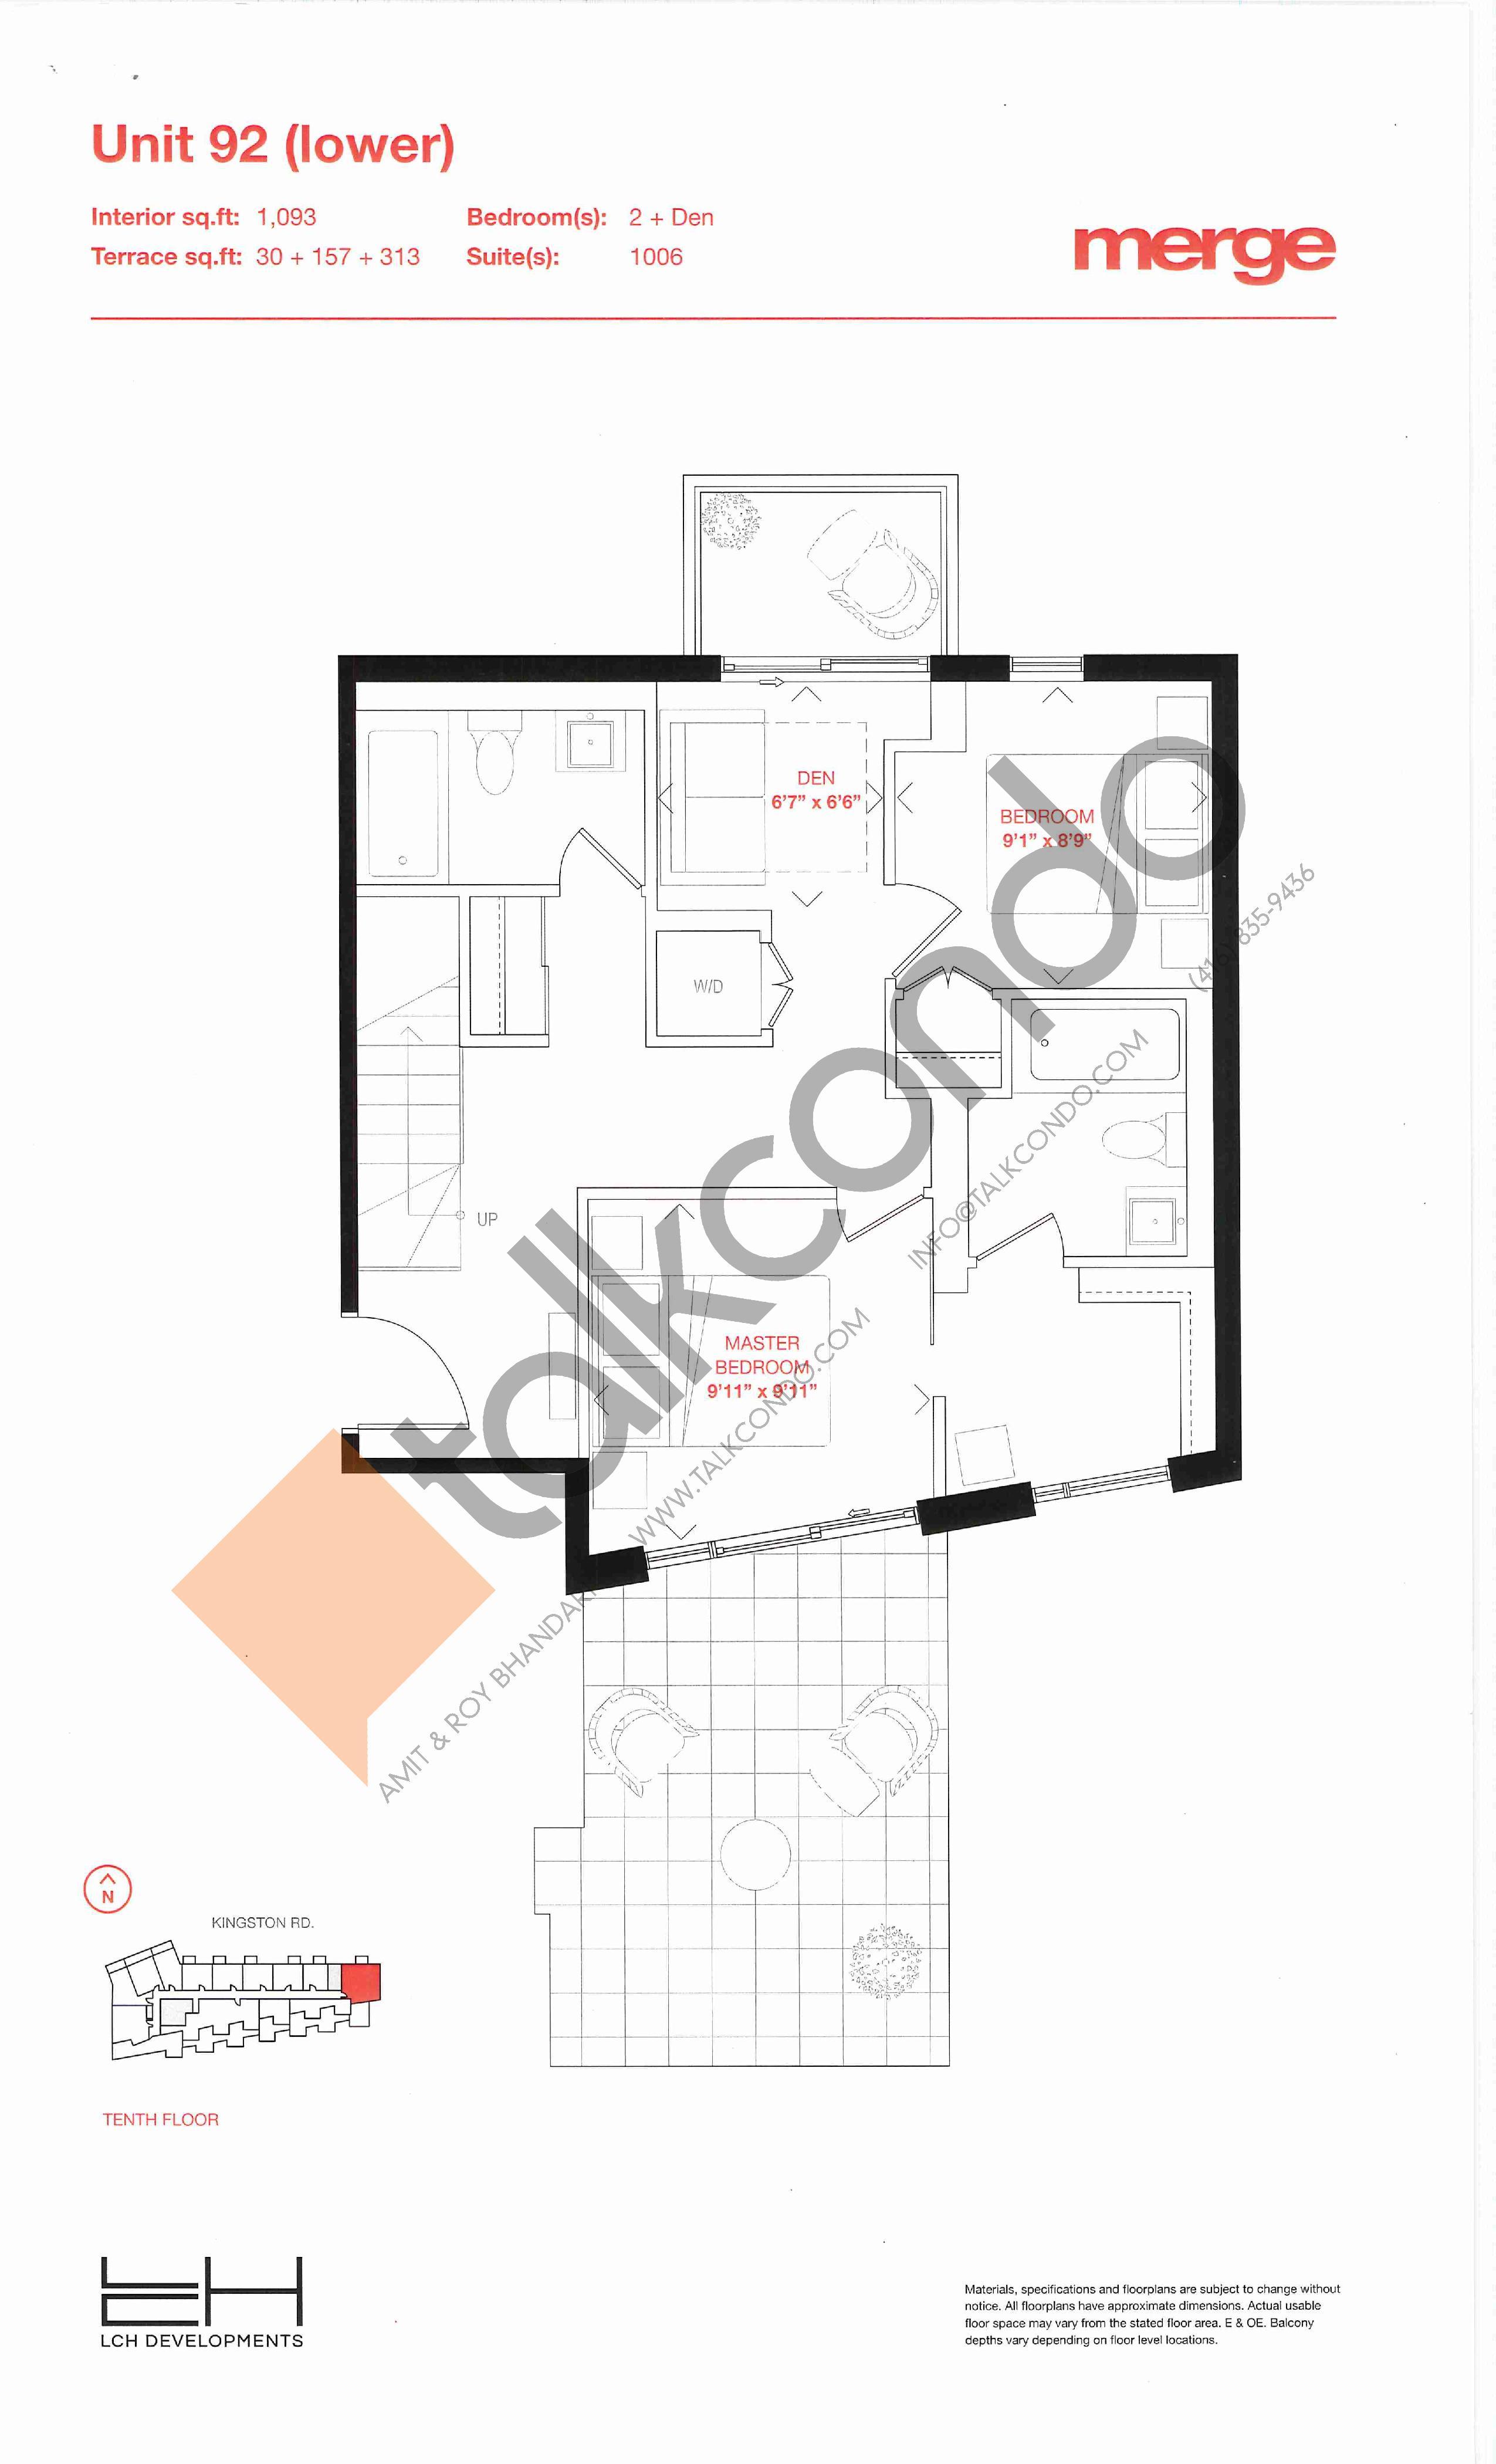 Unit 92 (Lower) Floor Plan at Merge Condos - 1093 sq.ft